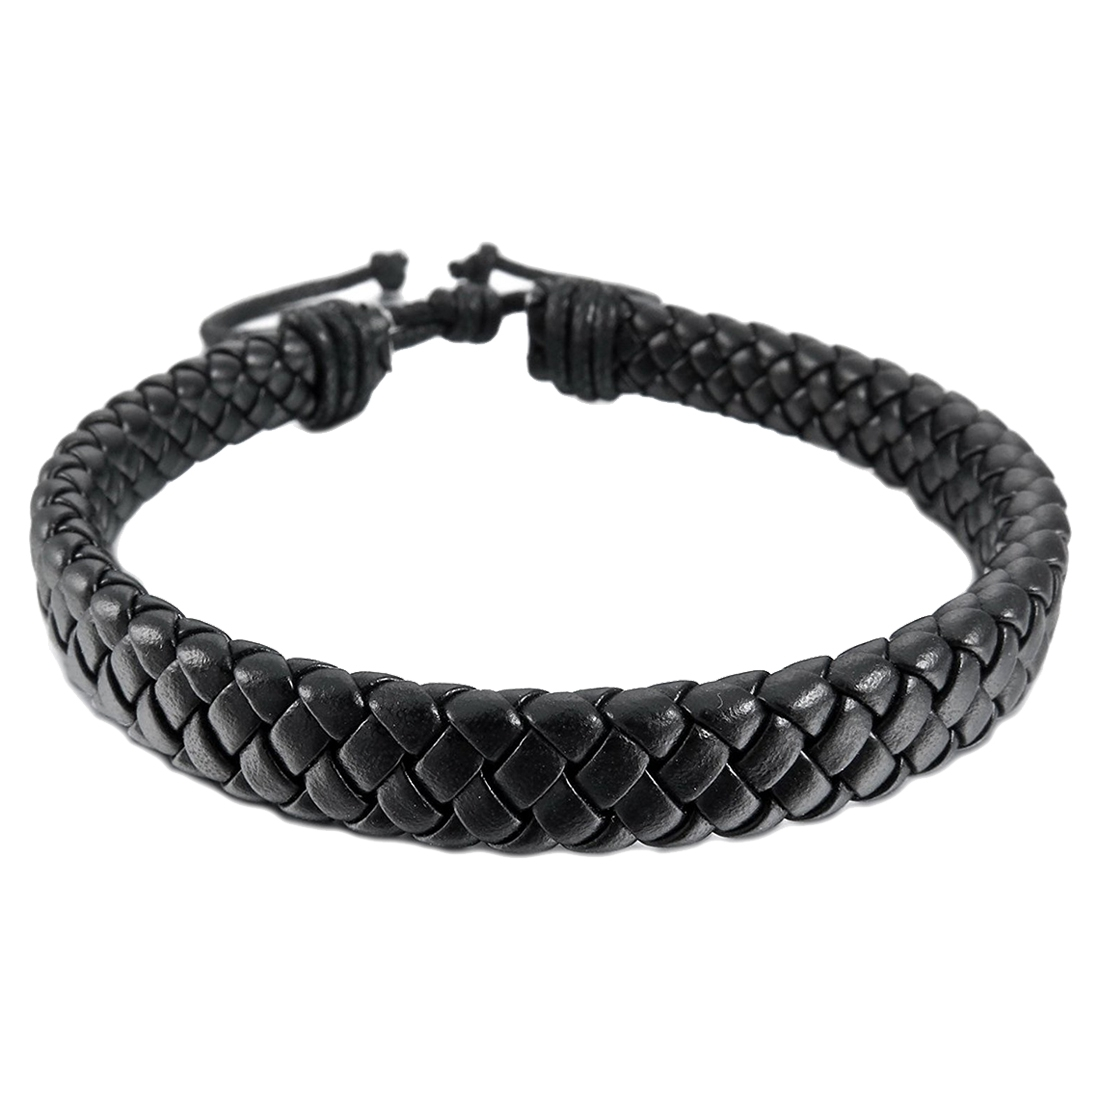 Leather Bracelet Bangle Cuff Rope Black Surfer Wrap